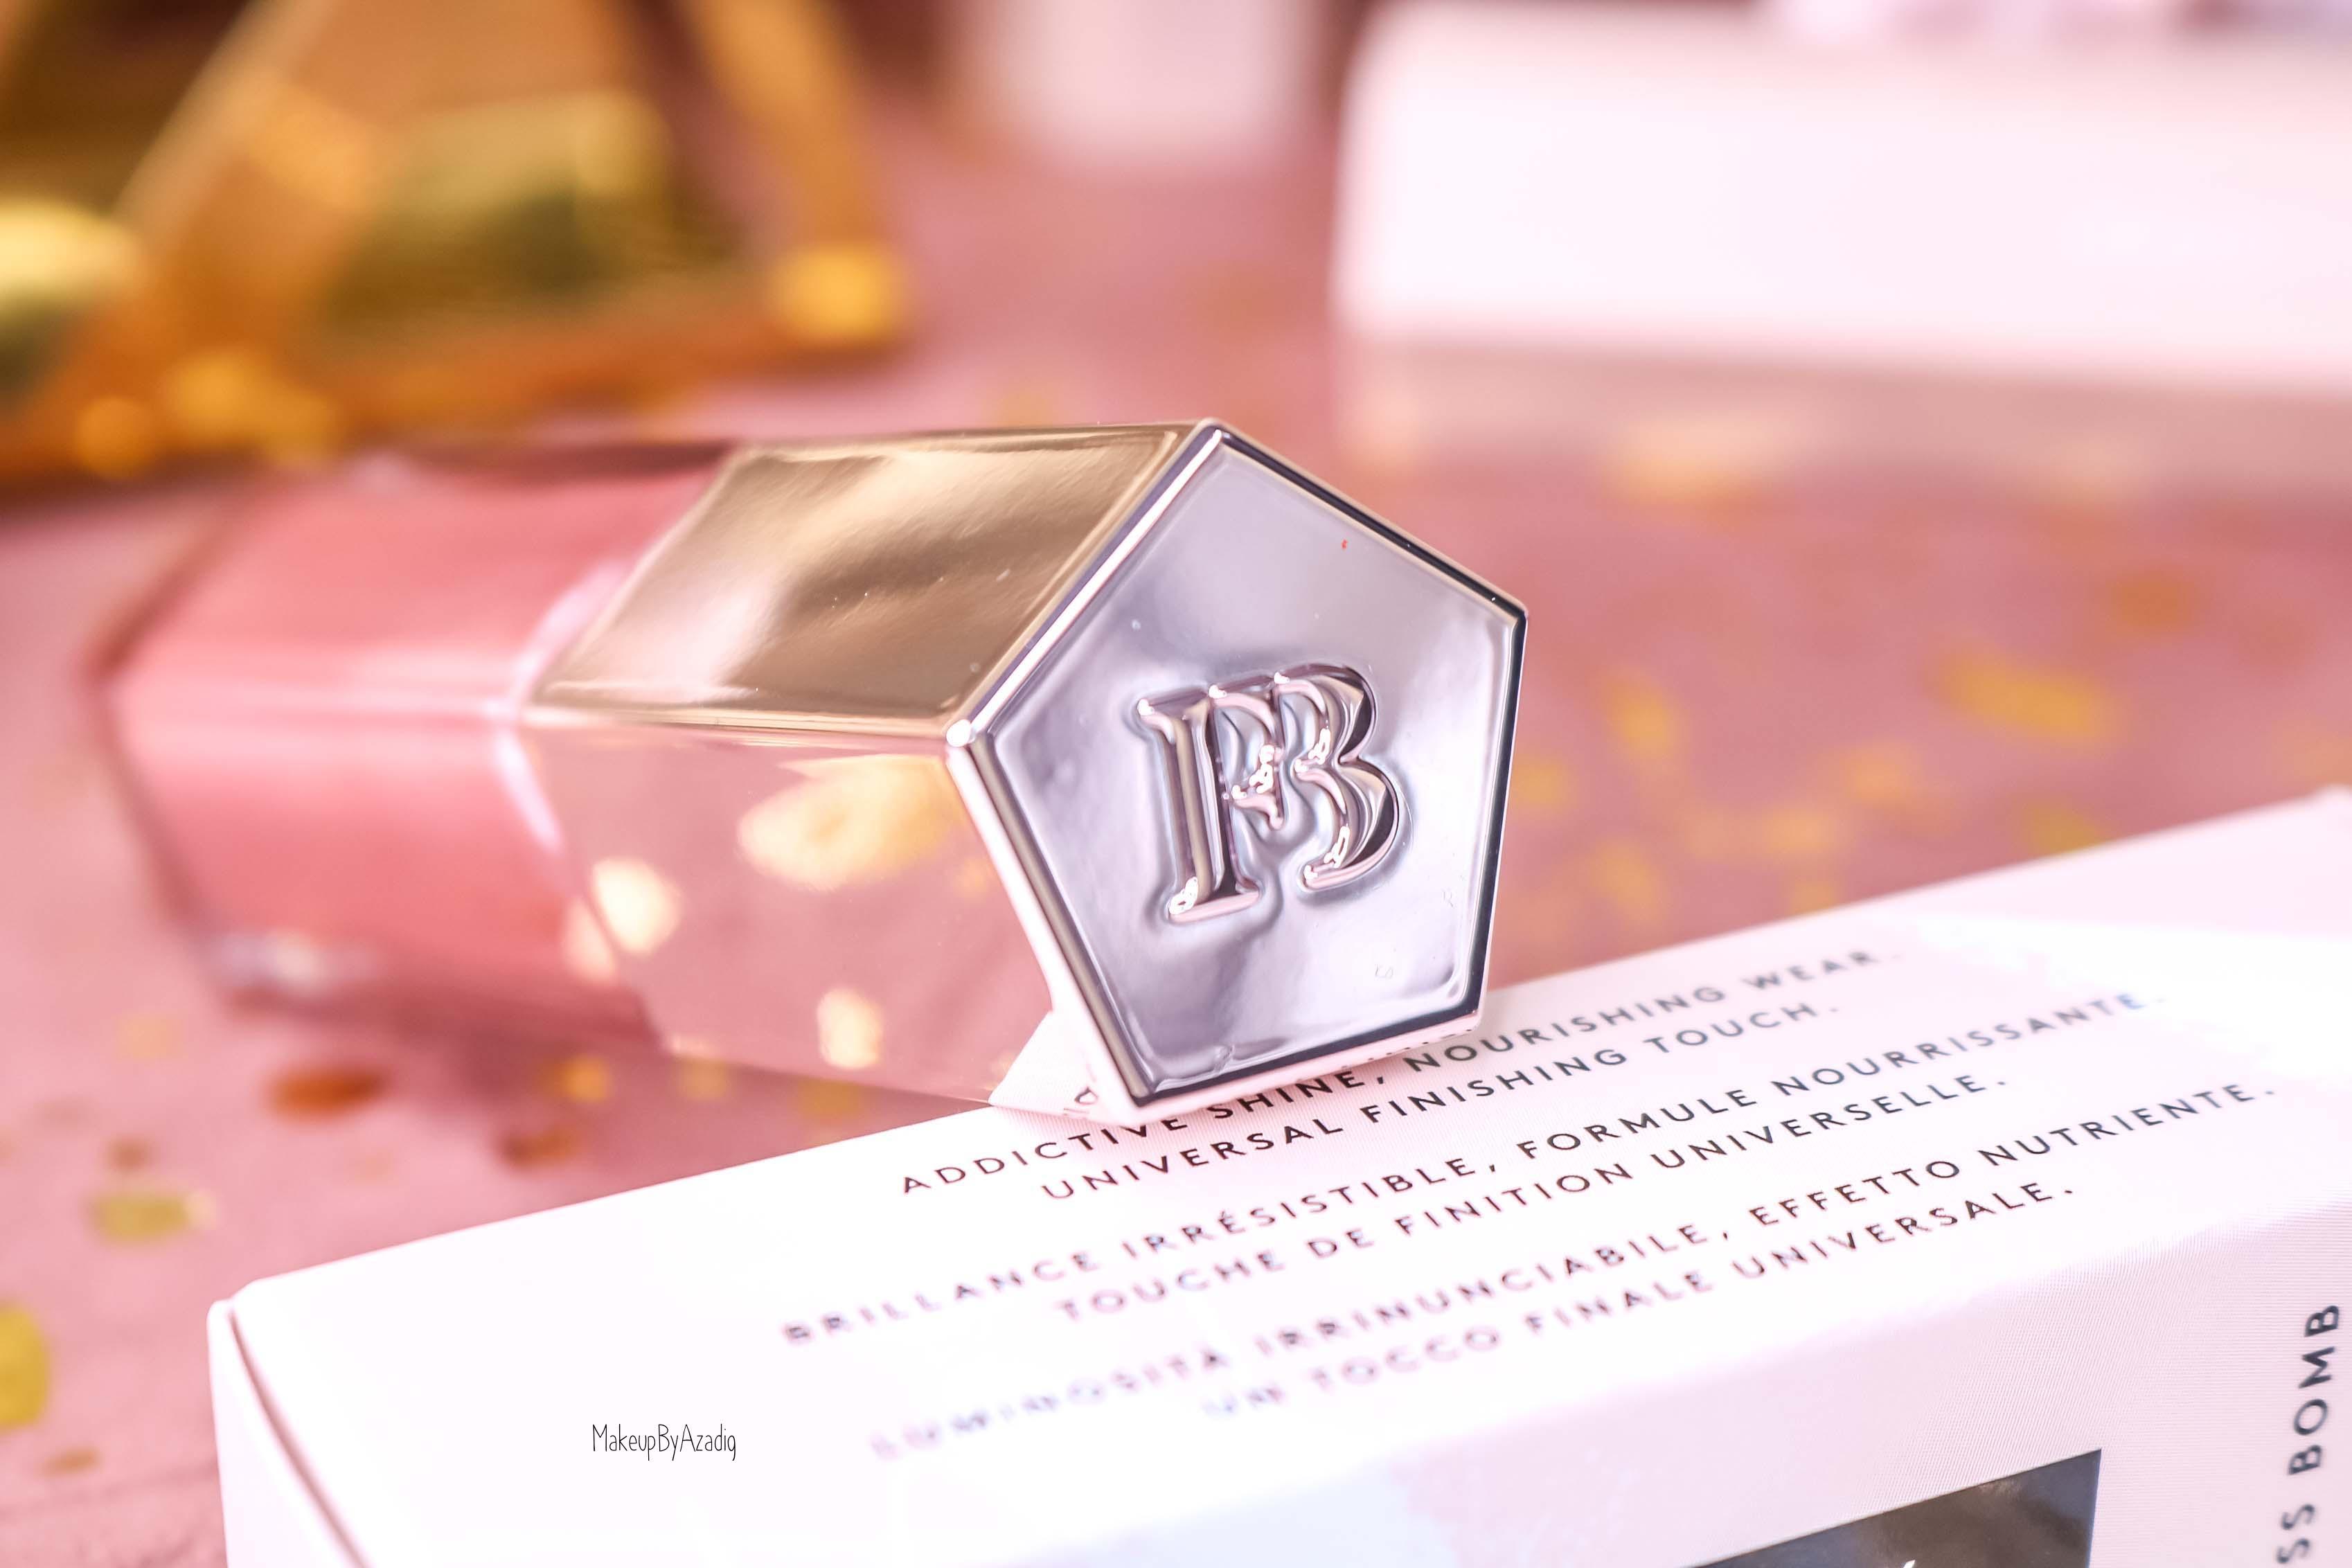 revue-gloss-levres-elumineur-universel-gloss-bomb-fussy-fenty-beauty-paris-rihanna-makeupbyazadig-lip-avis-prix-swatch-logo